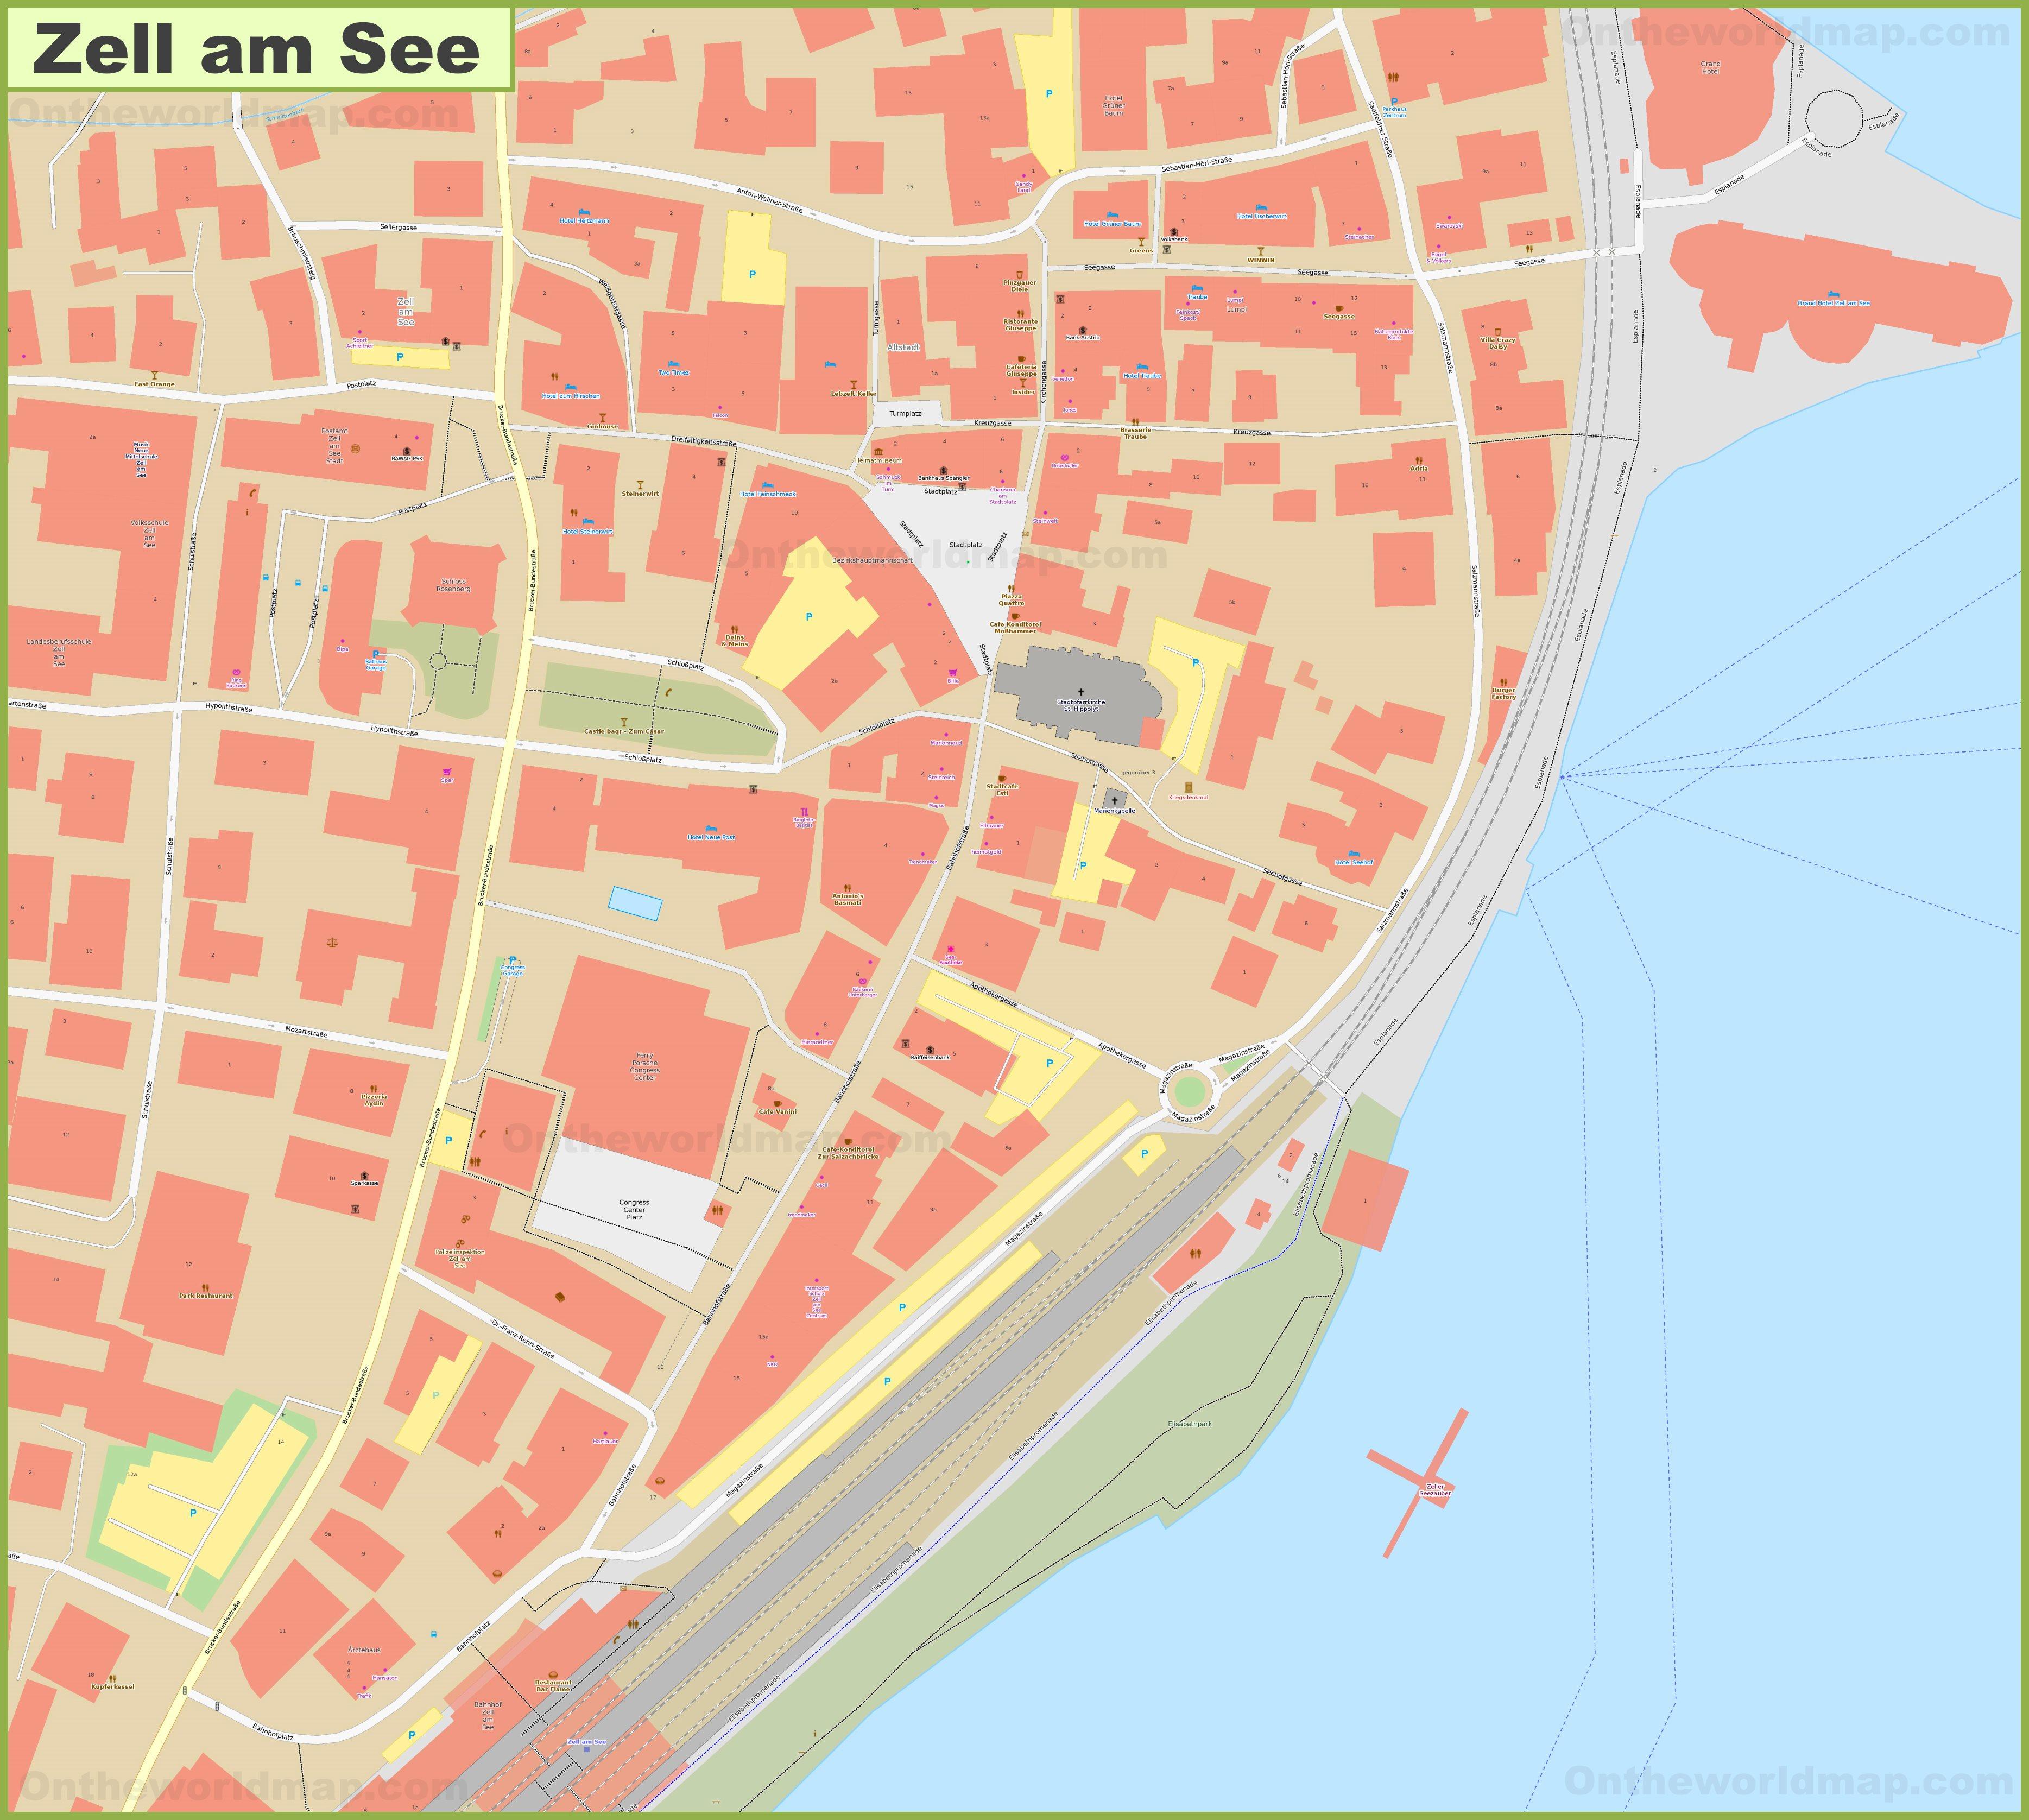 Zell am See city center map Zell Am See Austria Map on altmunster austria map, budapest austria map, zell am zee austria, tyrol austria map, igls austria map, eisenstadt austria map, new i am america map, otztal austria map, stubai austria map, munich austria map, innsbruck austria map, italy germany austria map, mariazell austria map, mauthausen austria map, vienna austria map, hopfgarten austria map, gosau austria map, berlin austria map, attersee austria map, salzkammergut austria map,